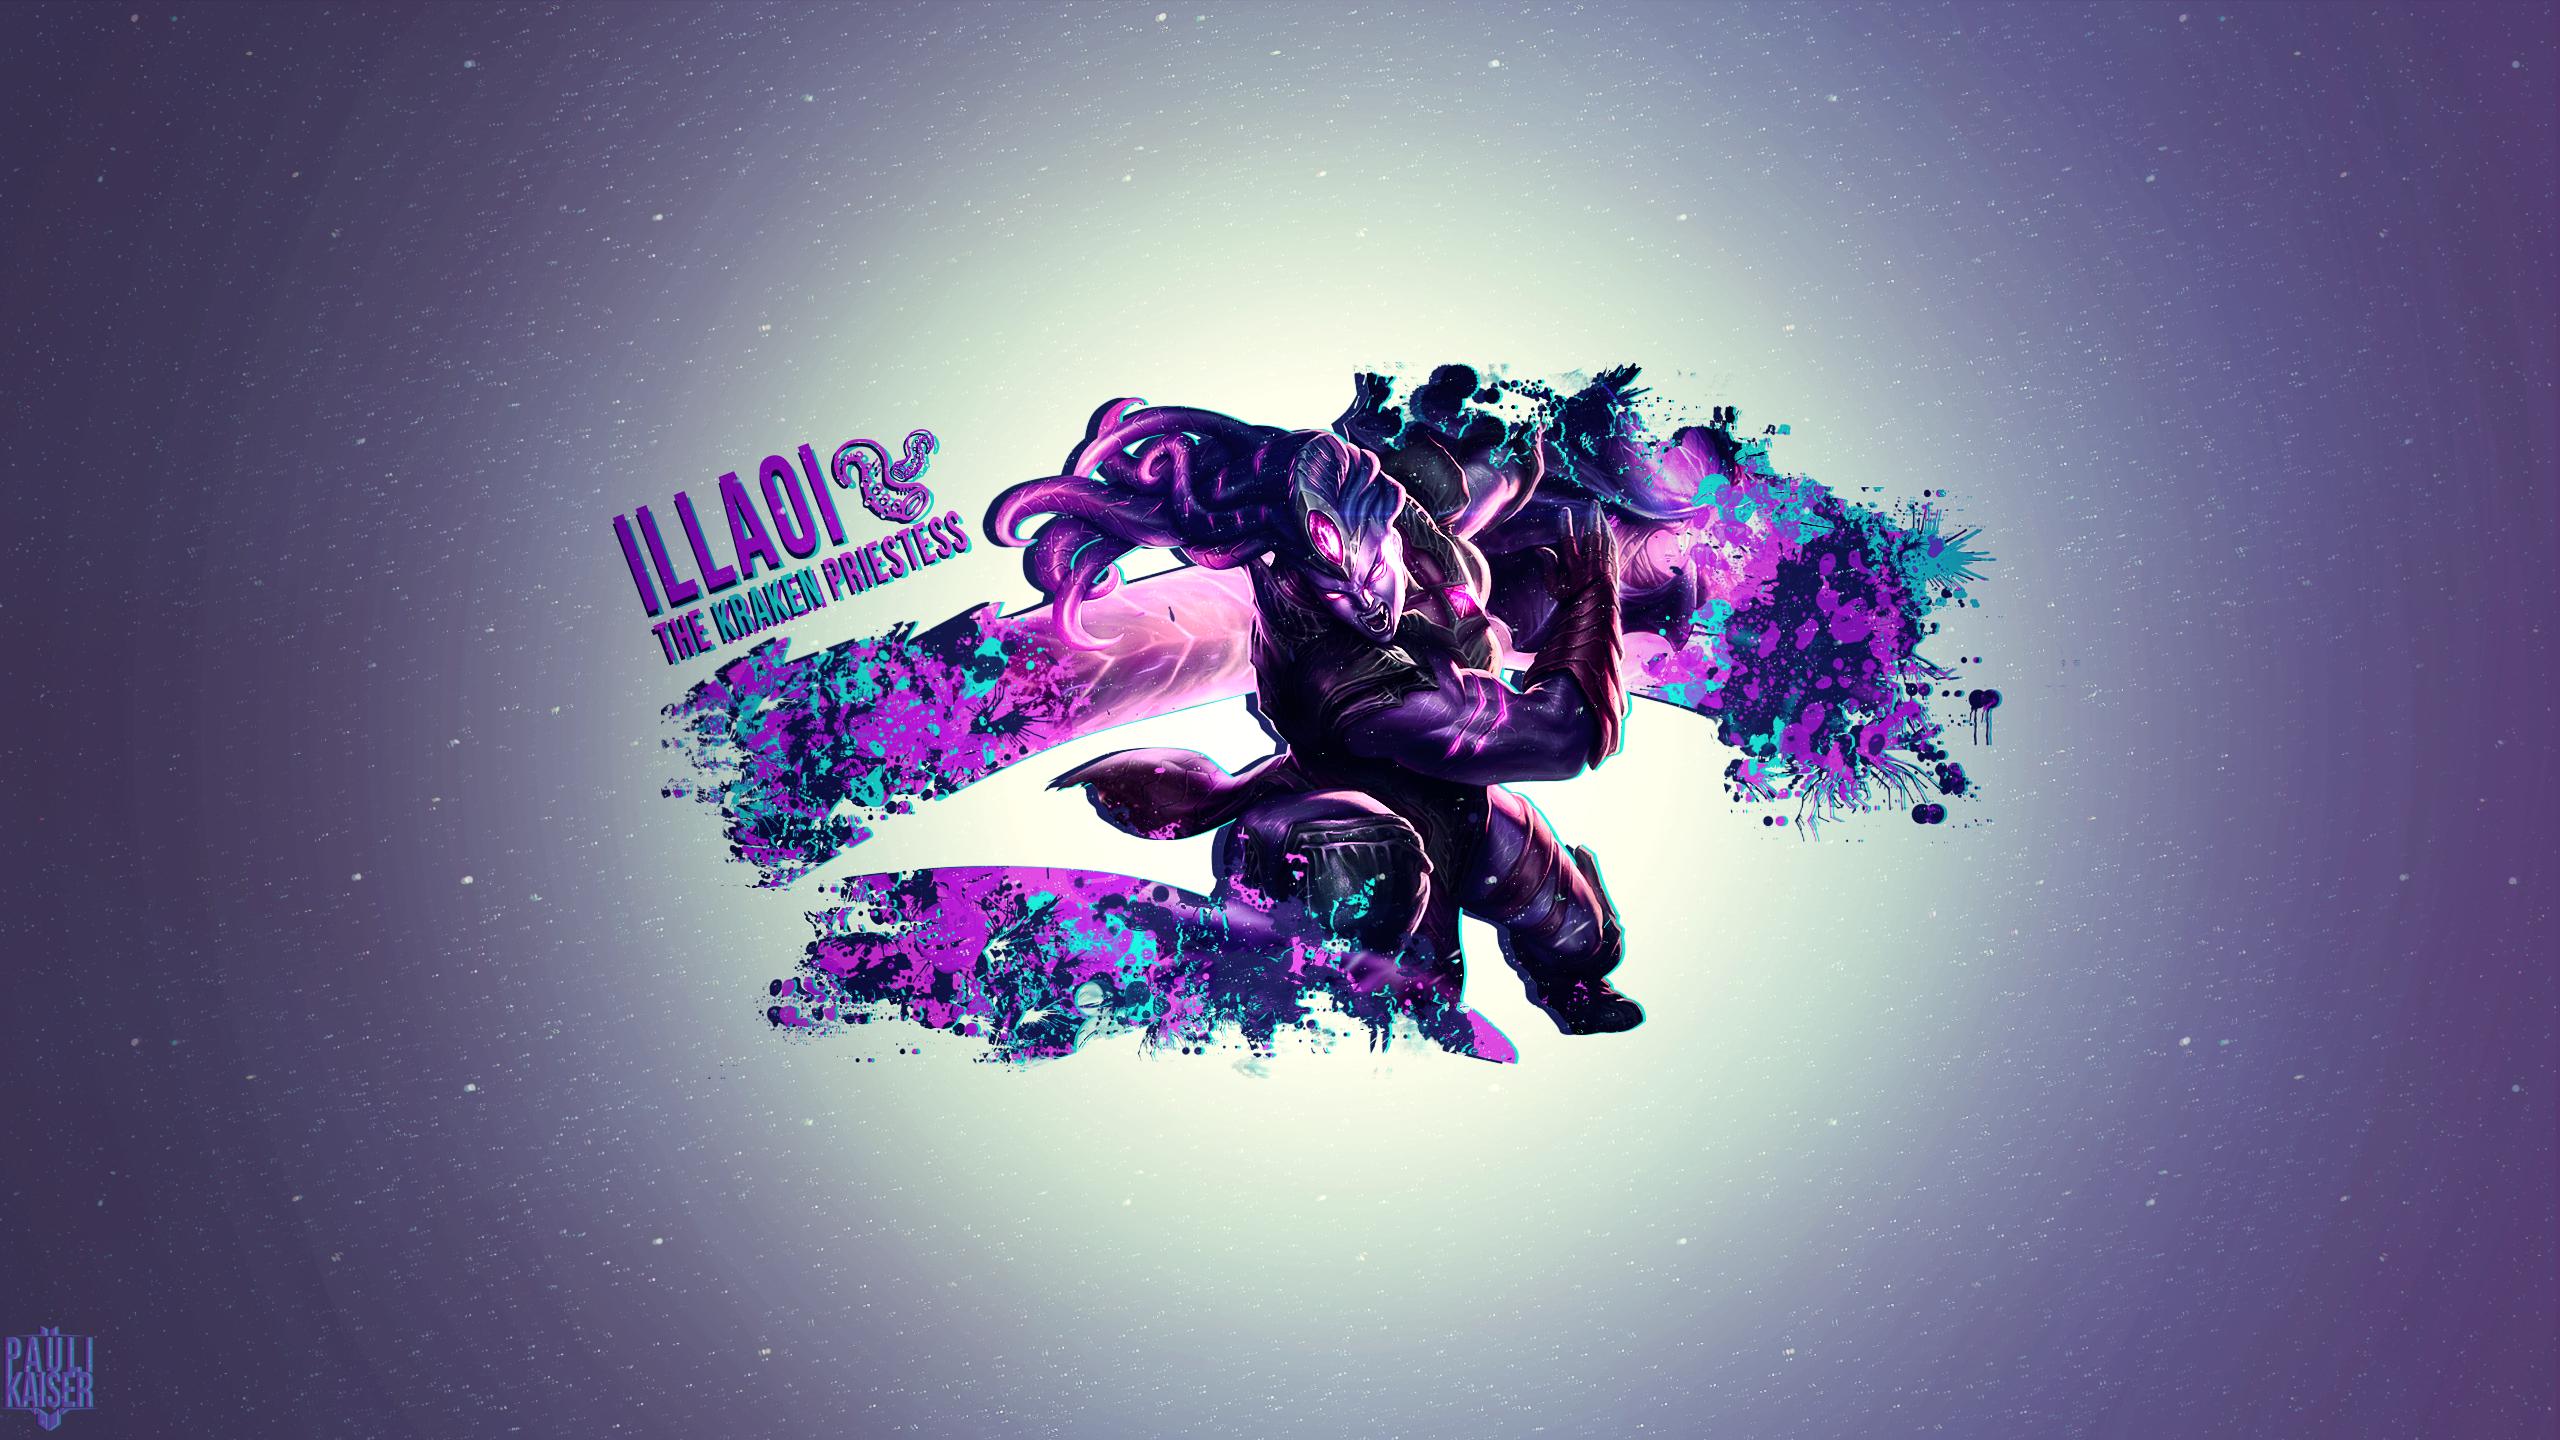 Void Bringer Illaoi wallpaper